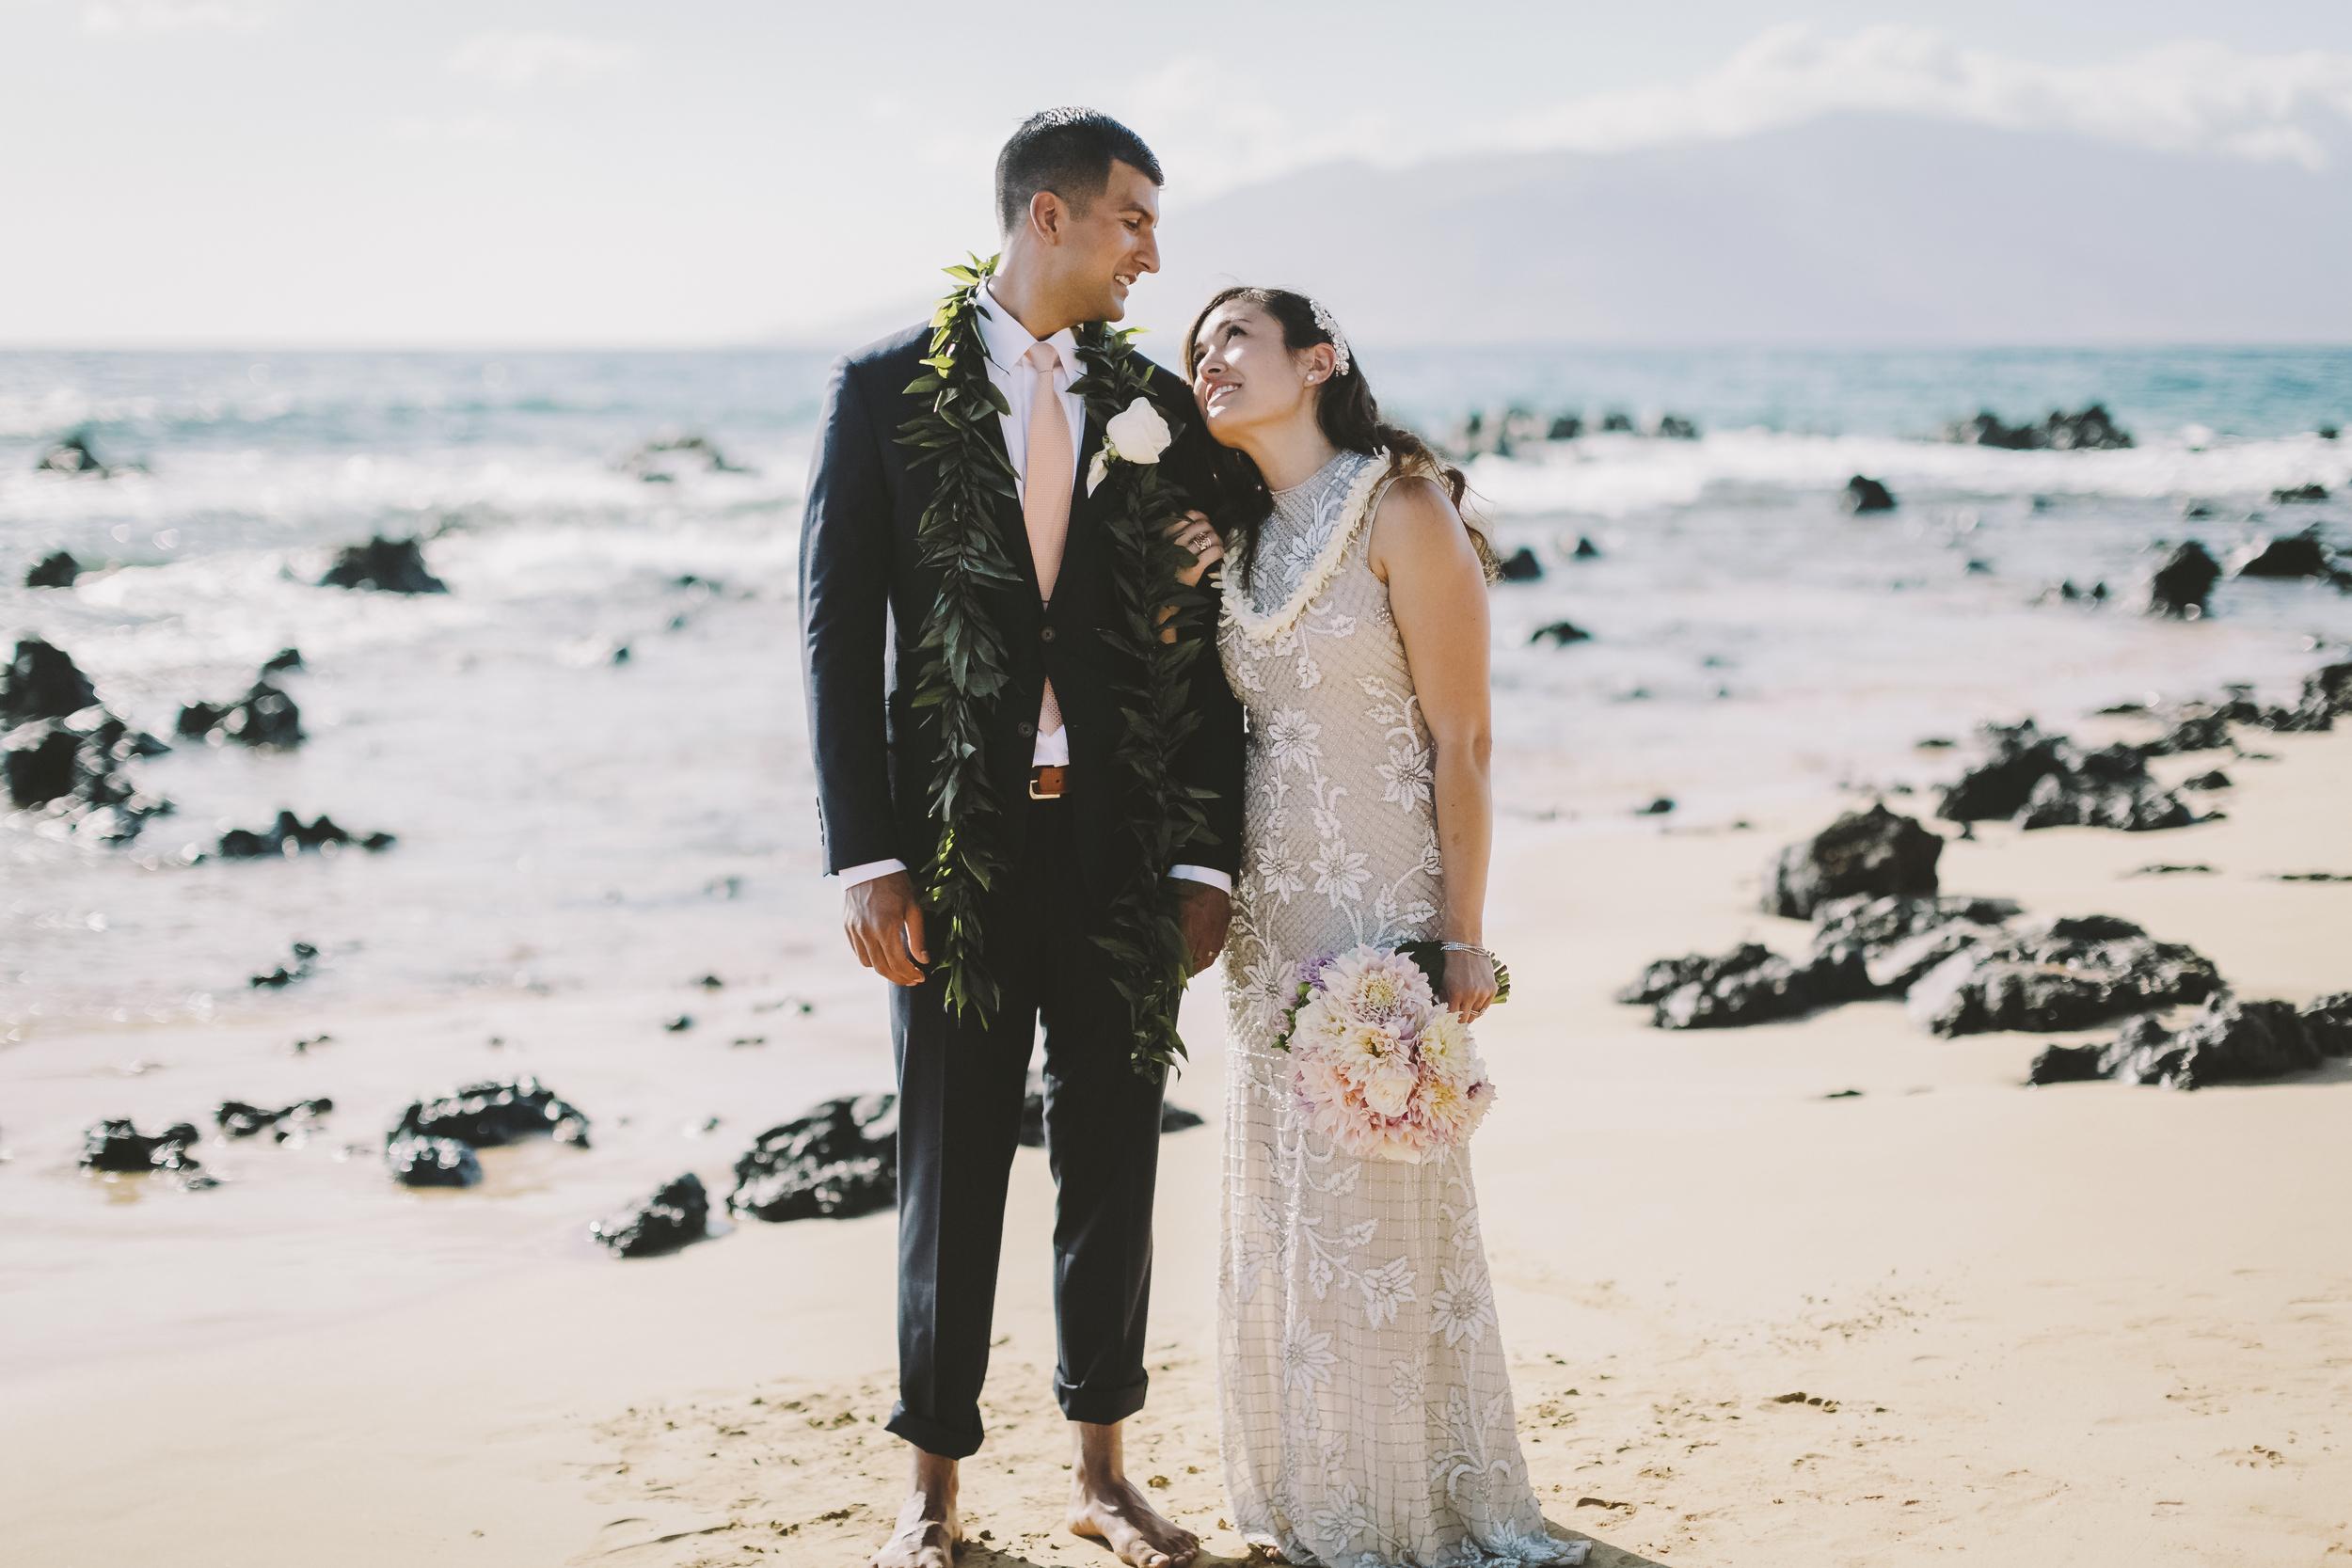 angie-diaz-photography-mokapu-beach-maui-elopement-29.jpg